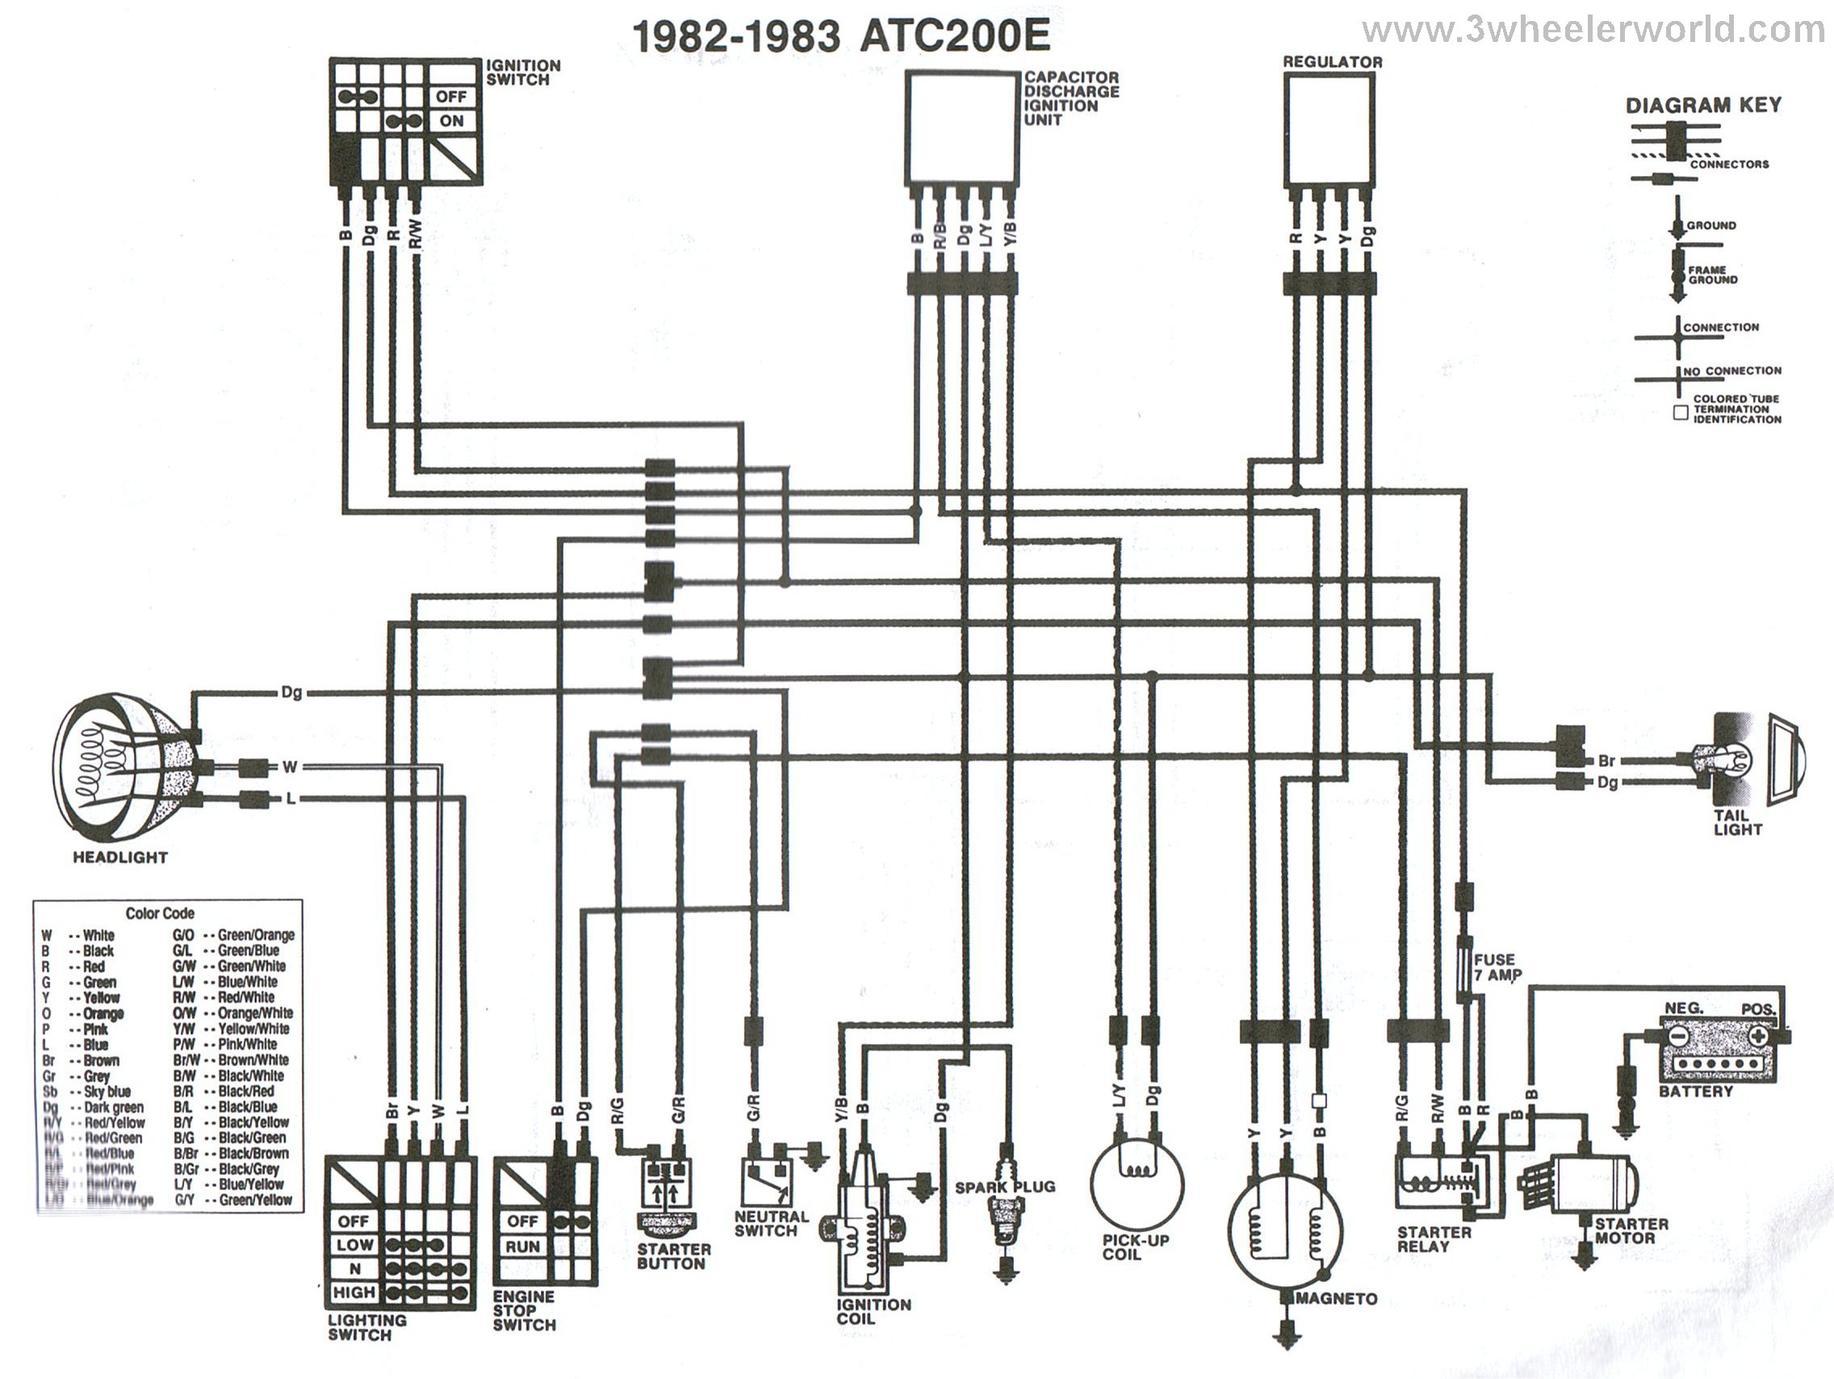 1985 honda trx 250 wiring diagram 1985 image 87 honda fourtrax 250 wiring schematic 87 discover your wiring on 1985 honda trx 250 wiring